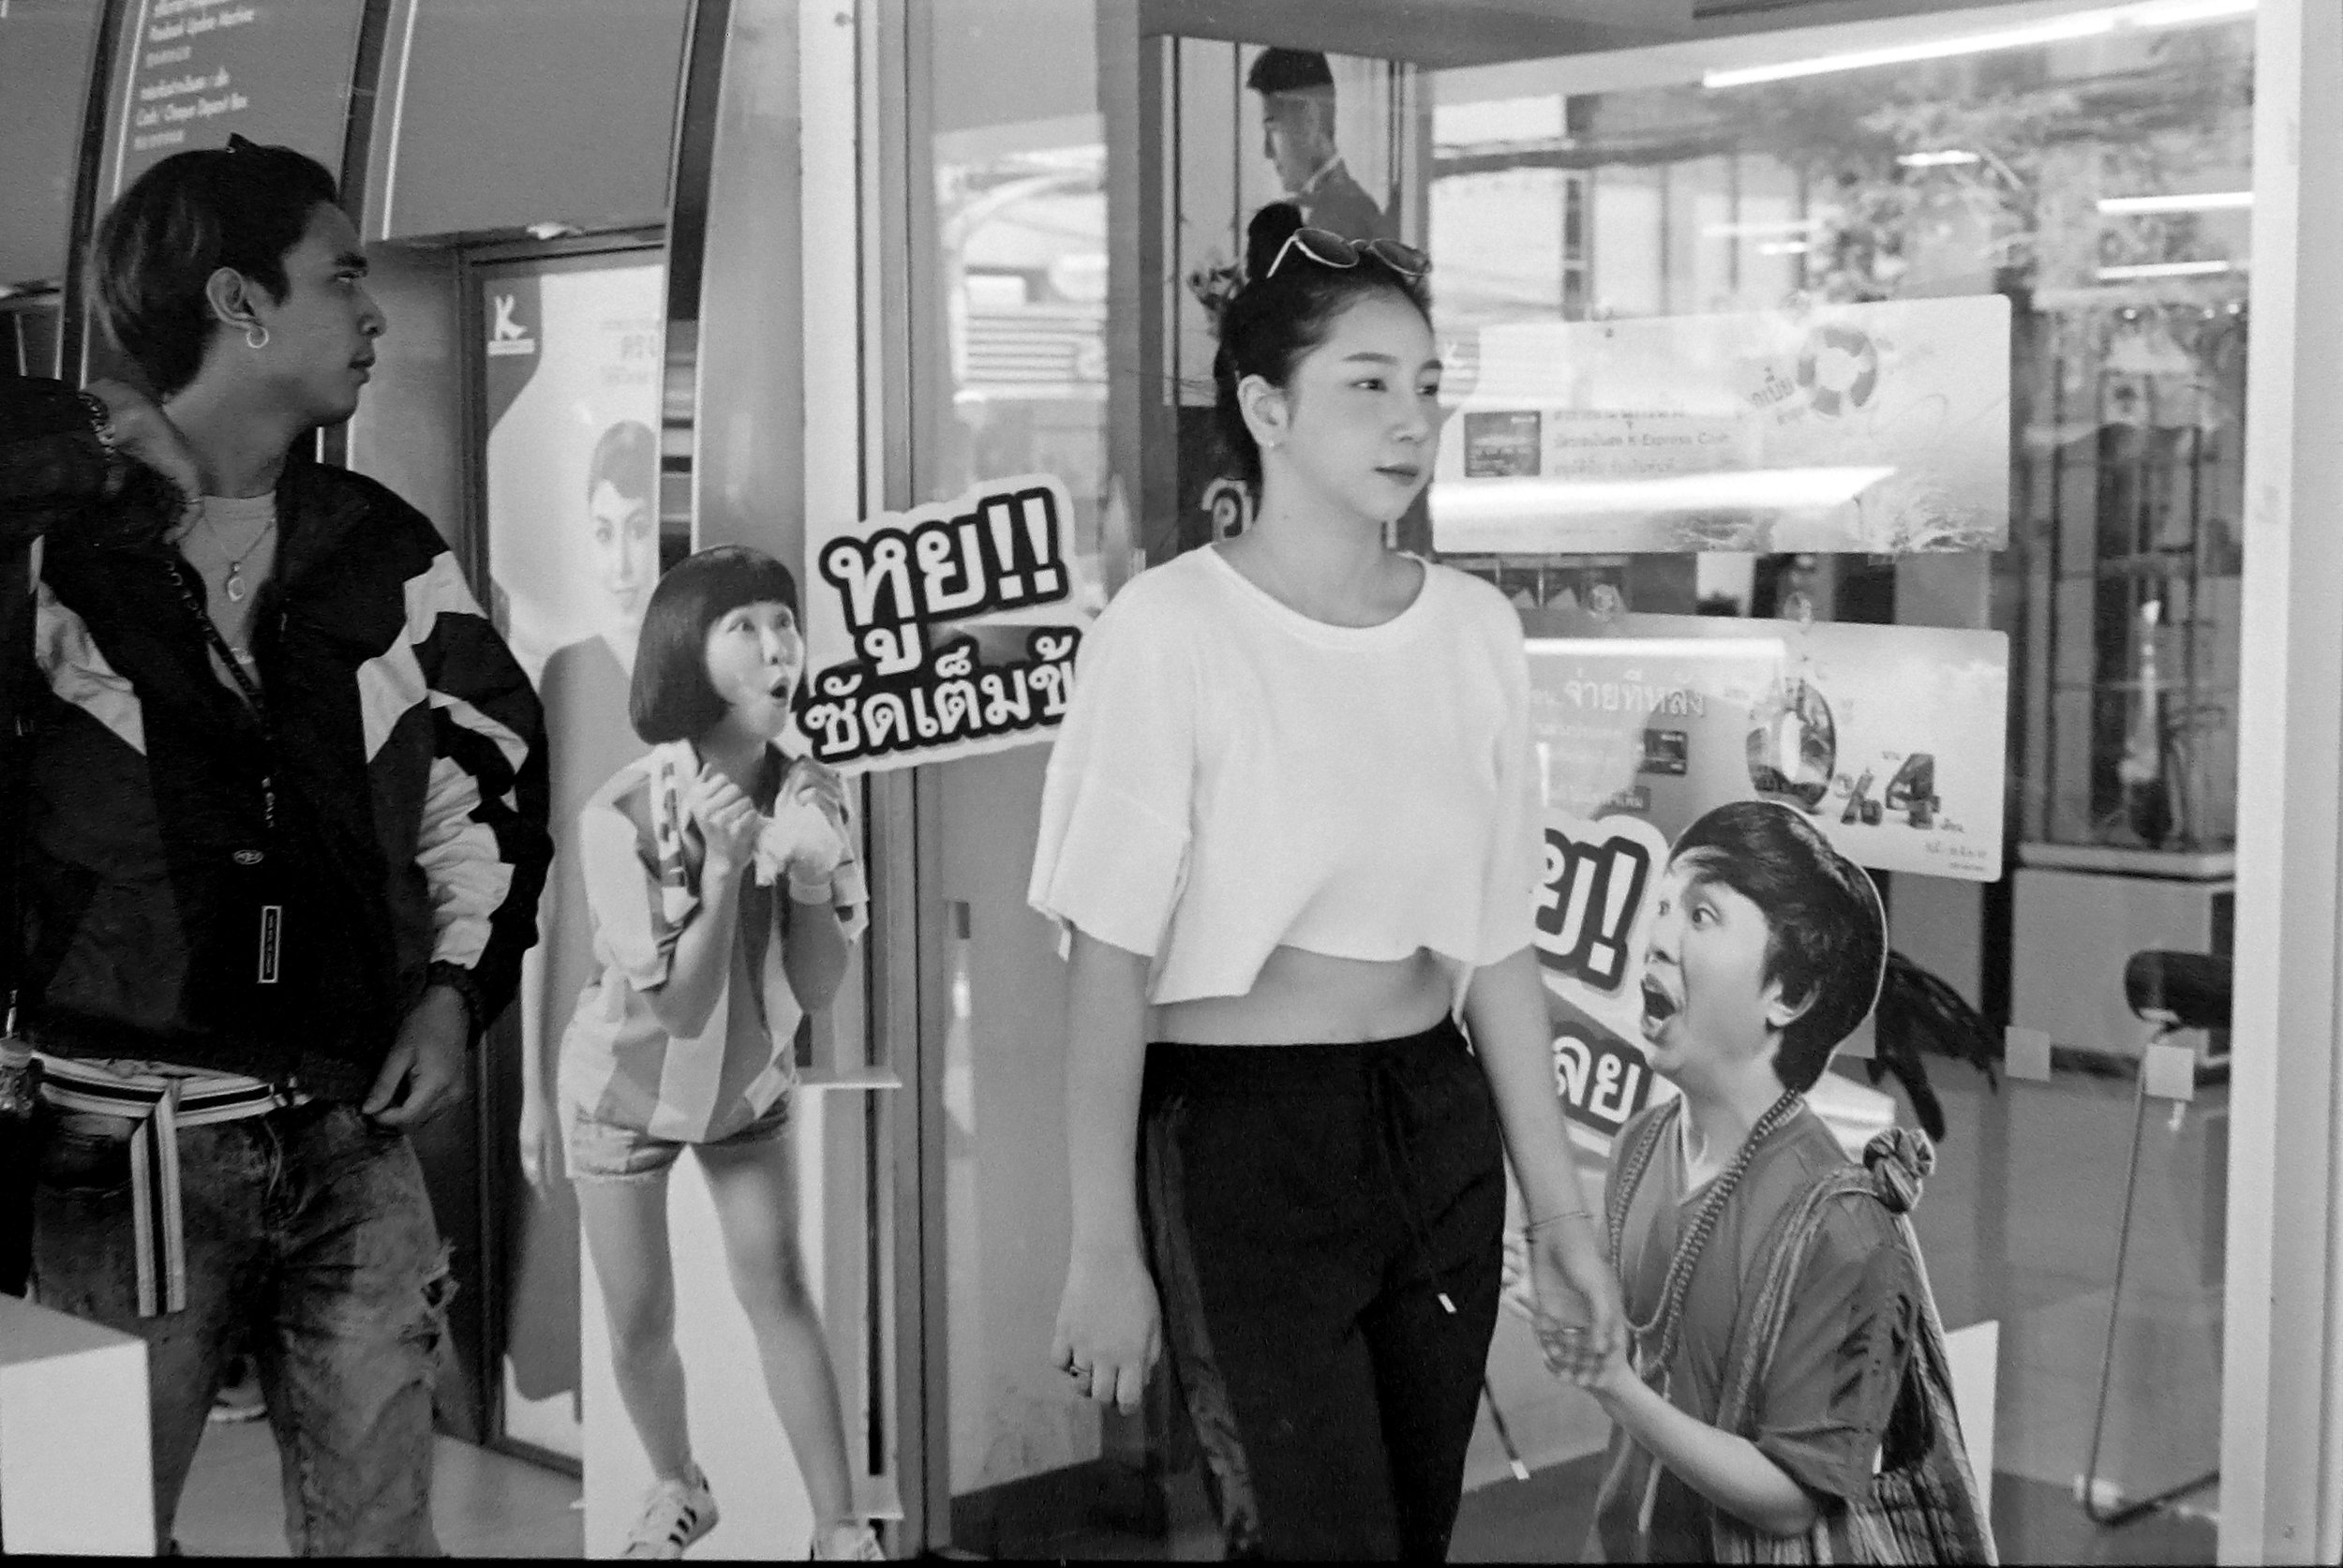 chromacomaphoto street photography bangkok thailand film tri x summicron rigid 50 leica m4 black and white (14).JPG